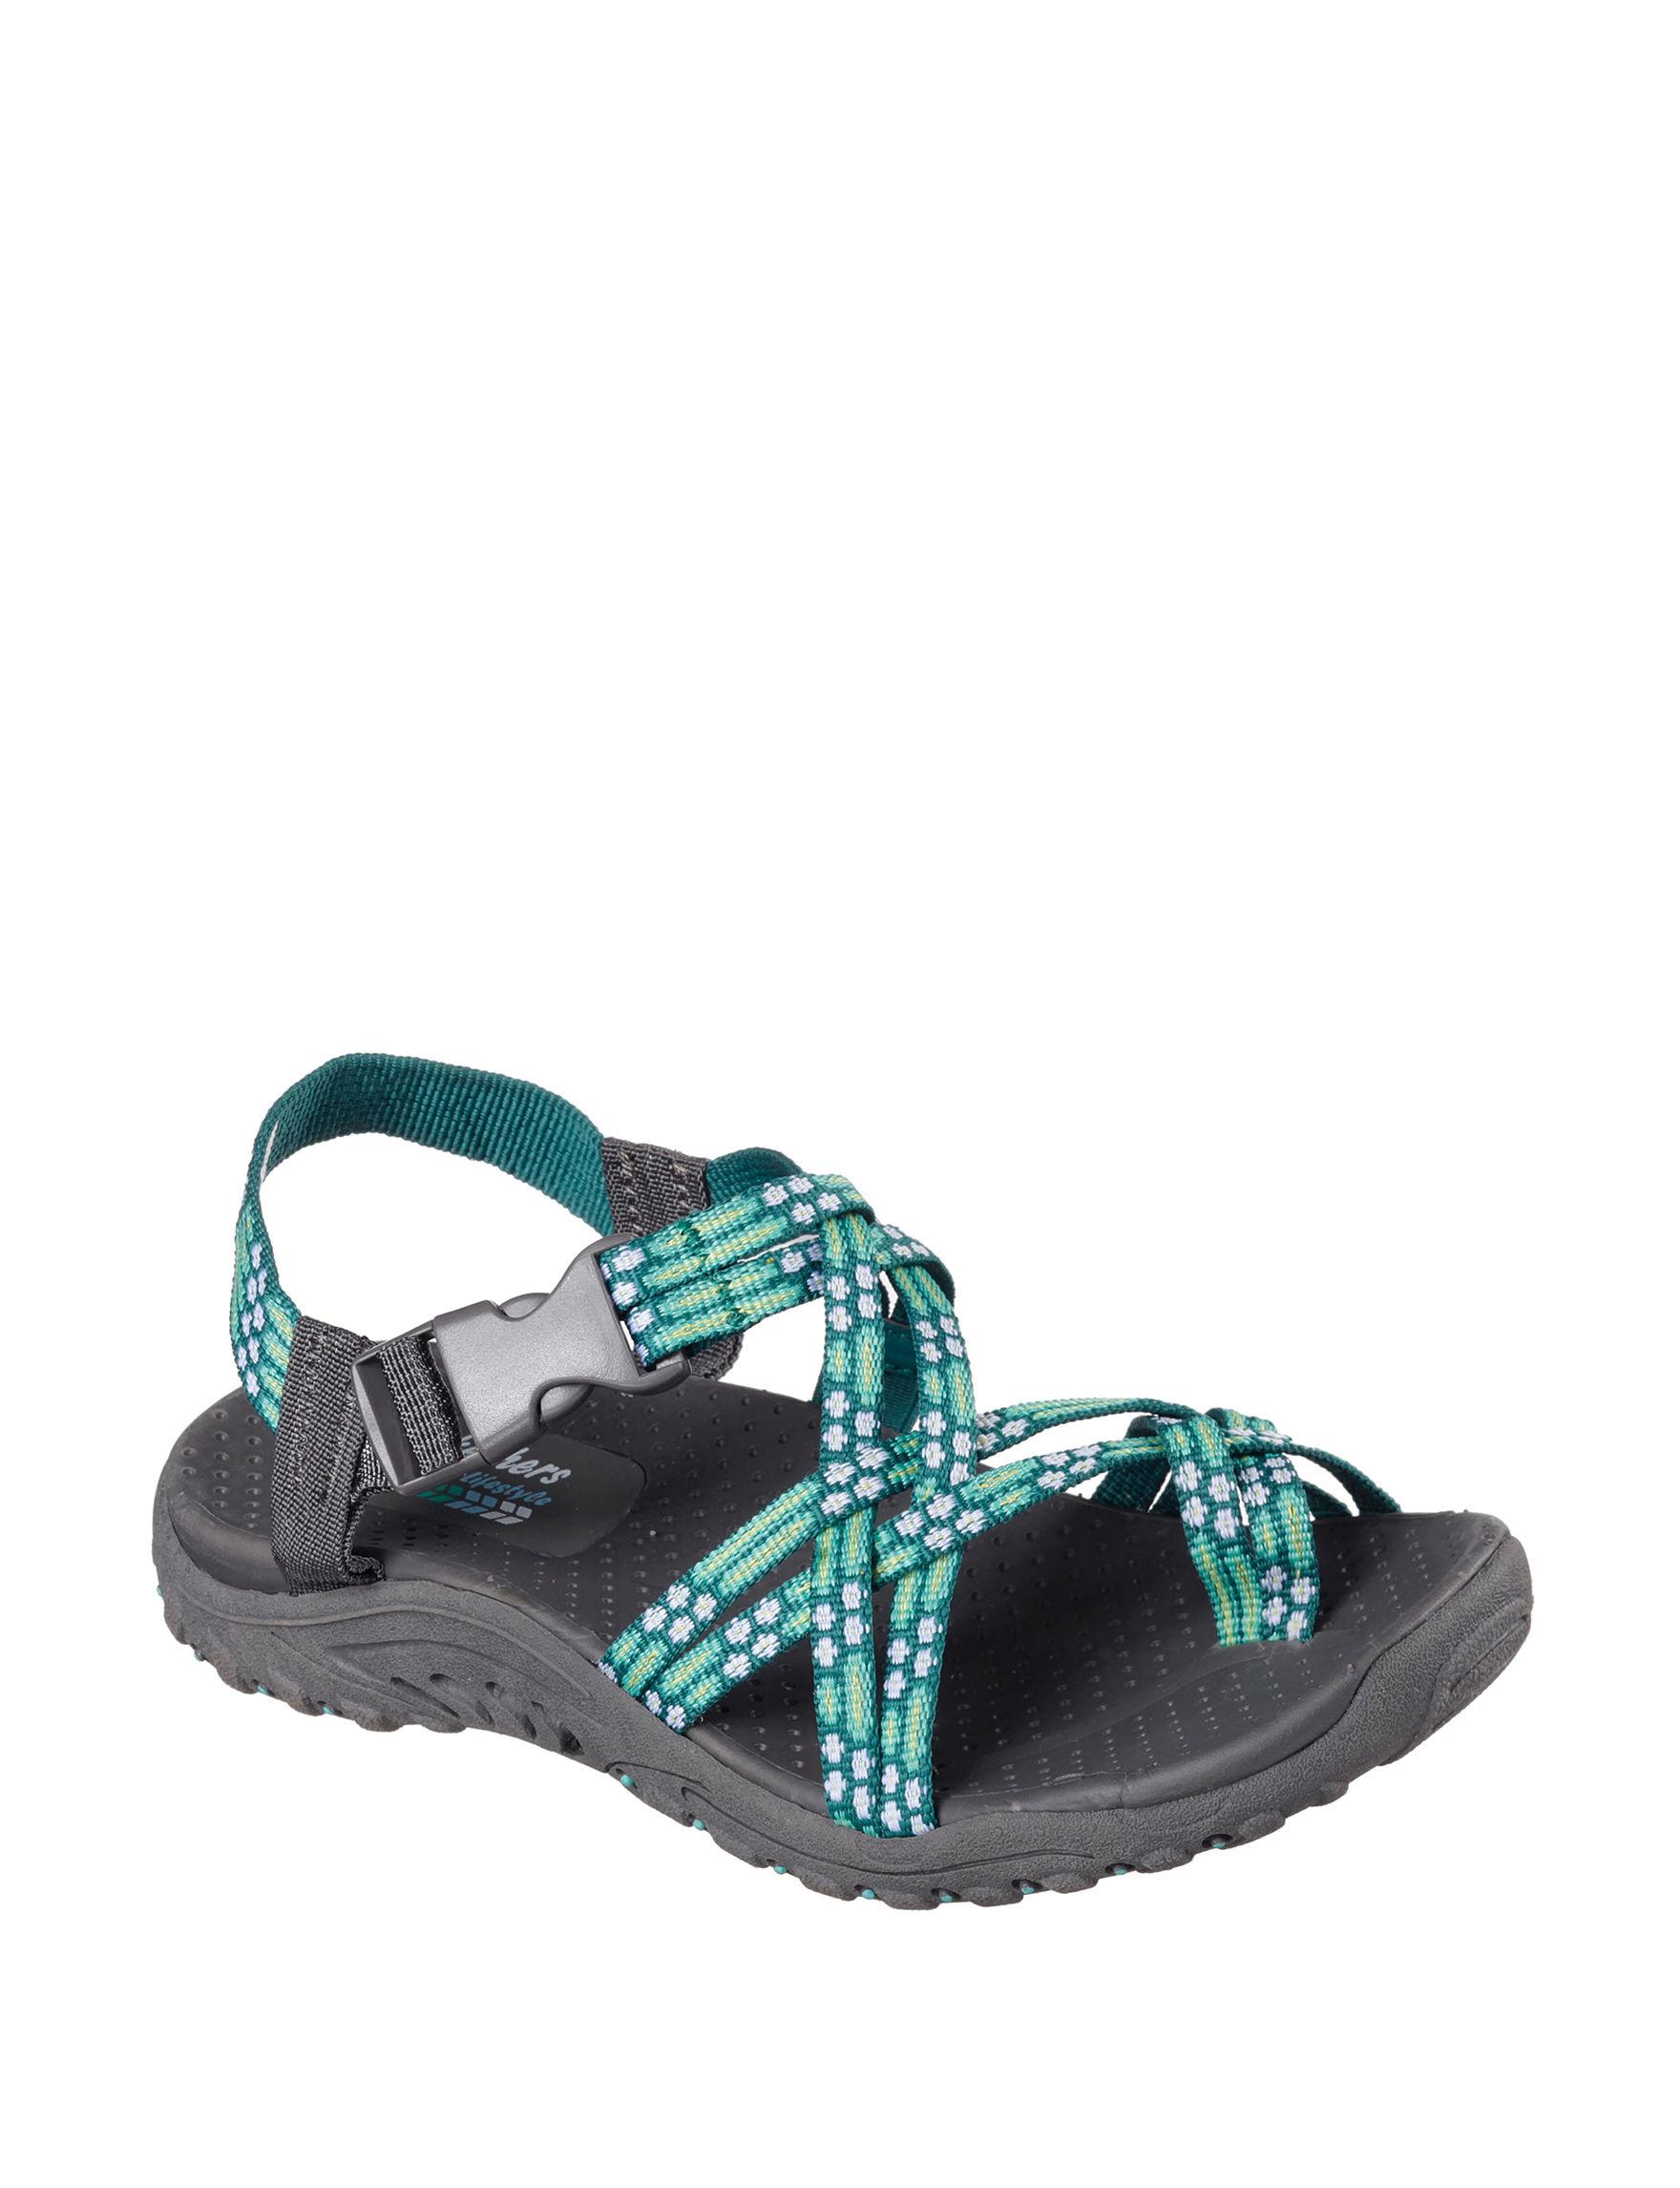 Skechers Mint Sport Sandals